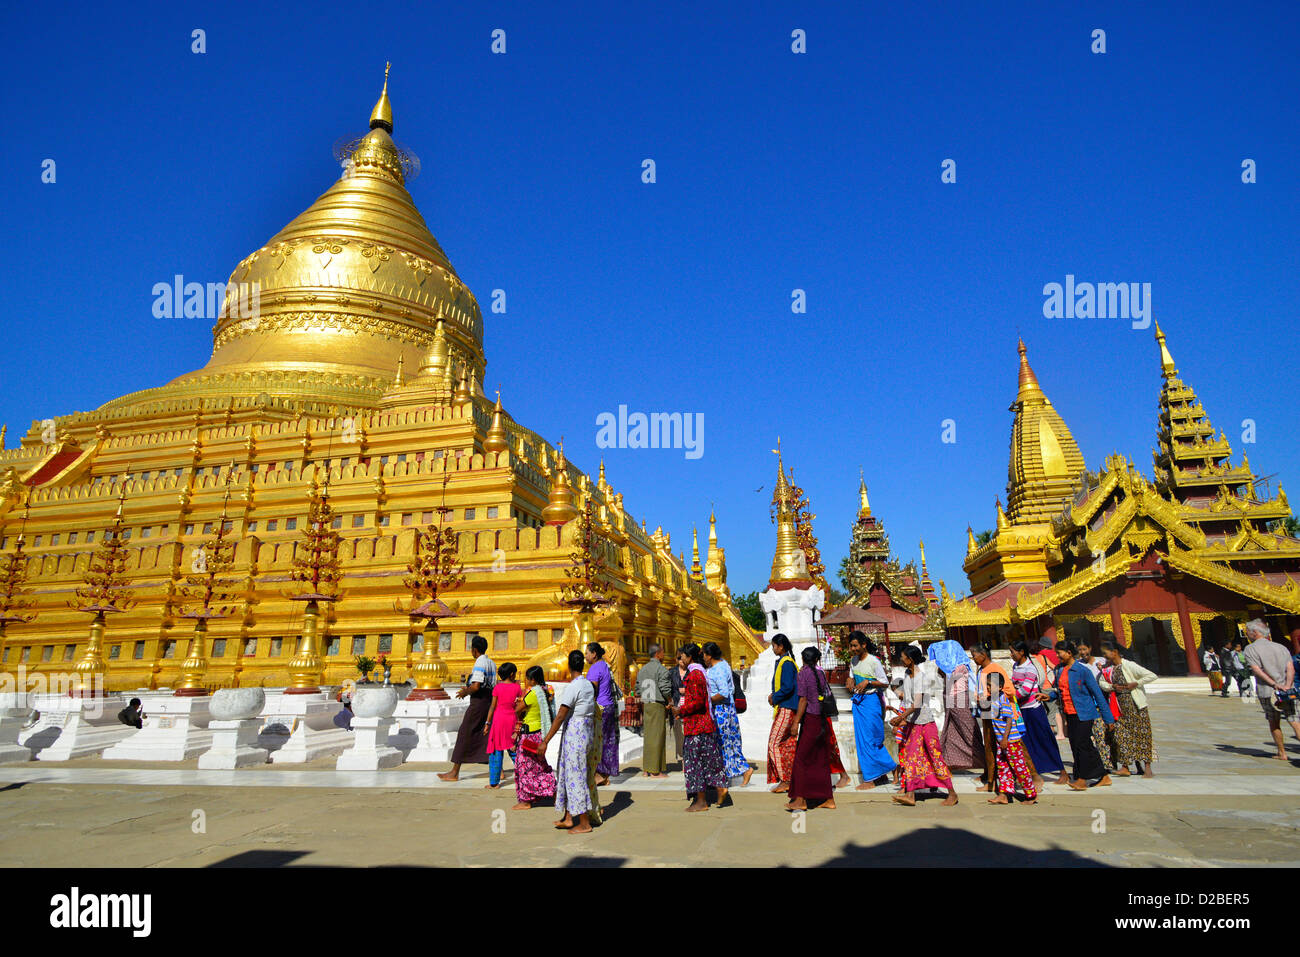 Pilgrims walk around the Shwezigon Paya Golden Pagoda in Paya, Bagan, Myanmar. Stock Photo